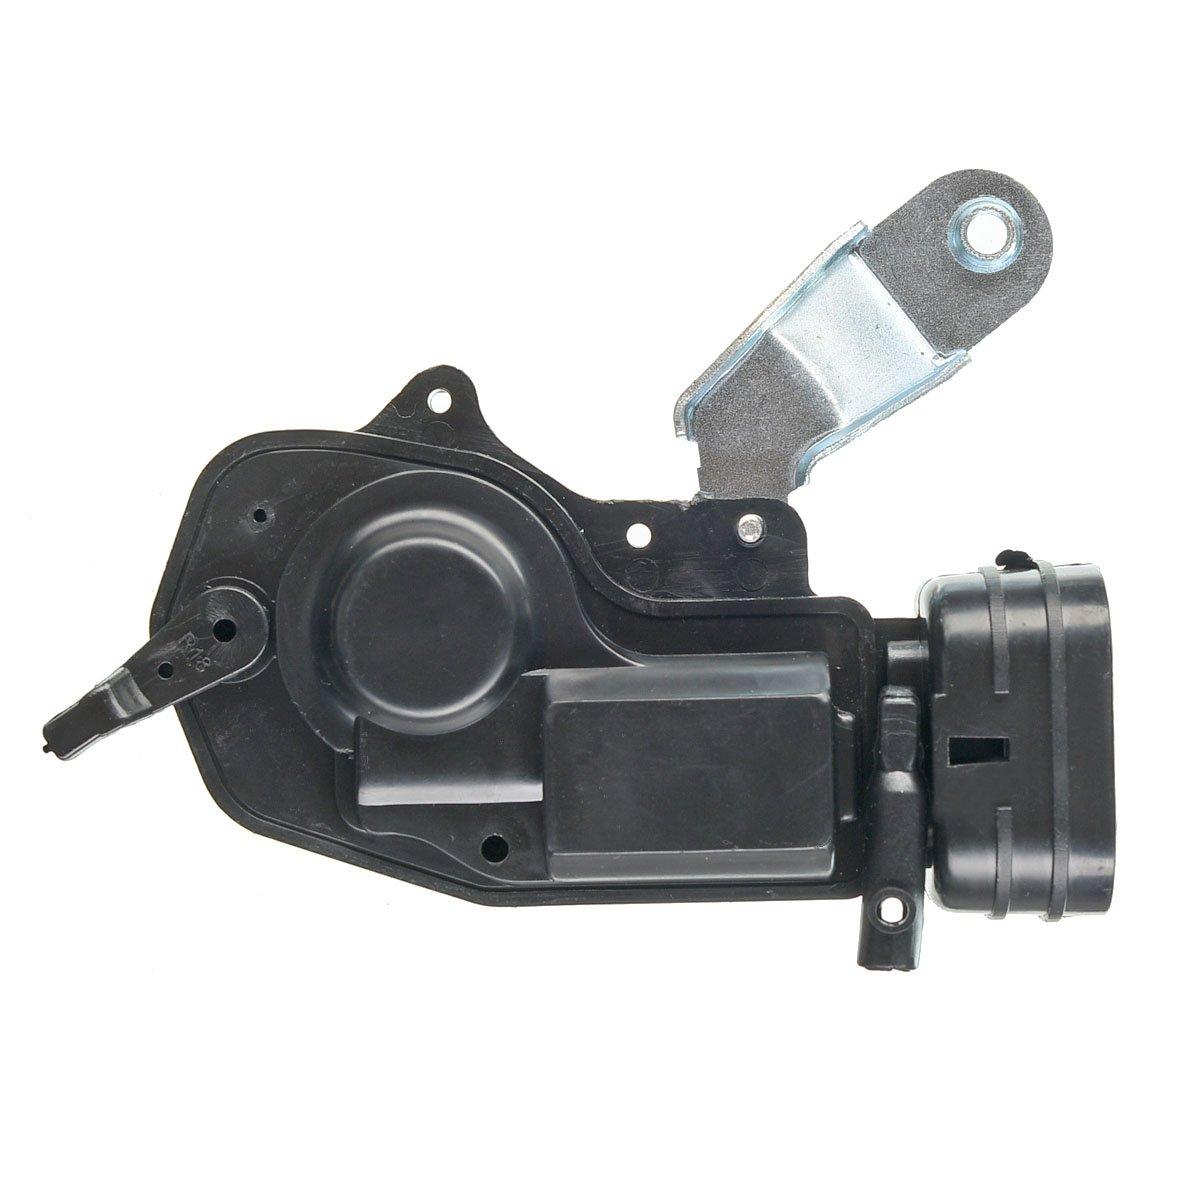 A-Premium Door Lock Actuator Motor for Toyota 4Runner 1996-2002 Front Right Passenger Side 69110-35050